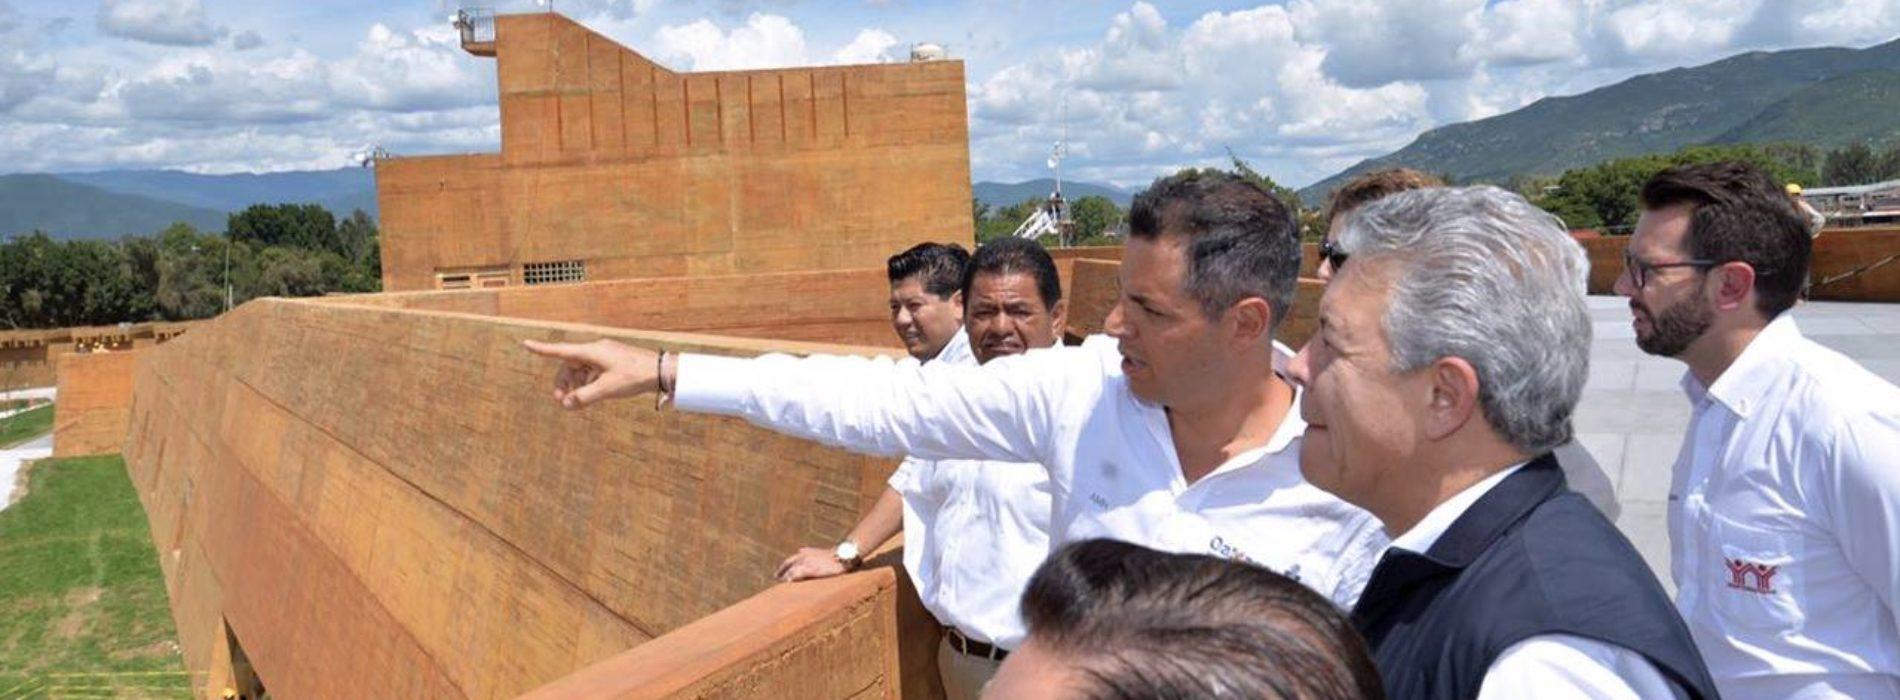 Gobernador Recorre Centro Cultural, previó a la visita presidencial.